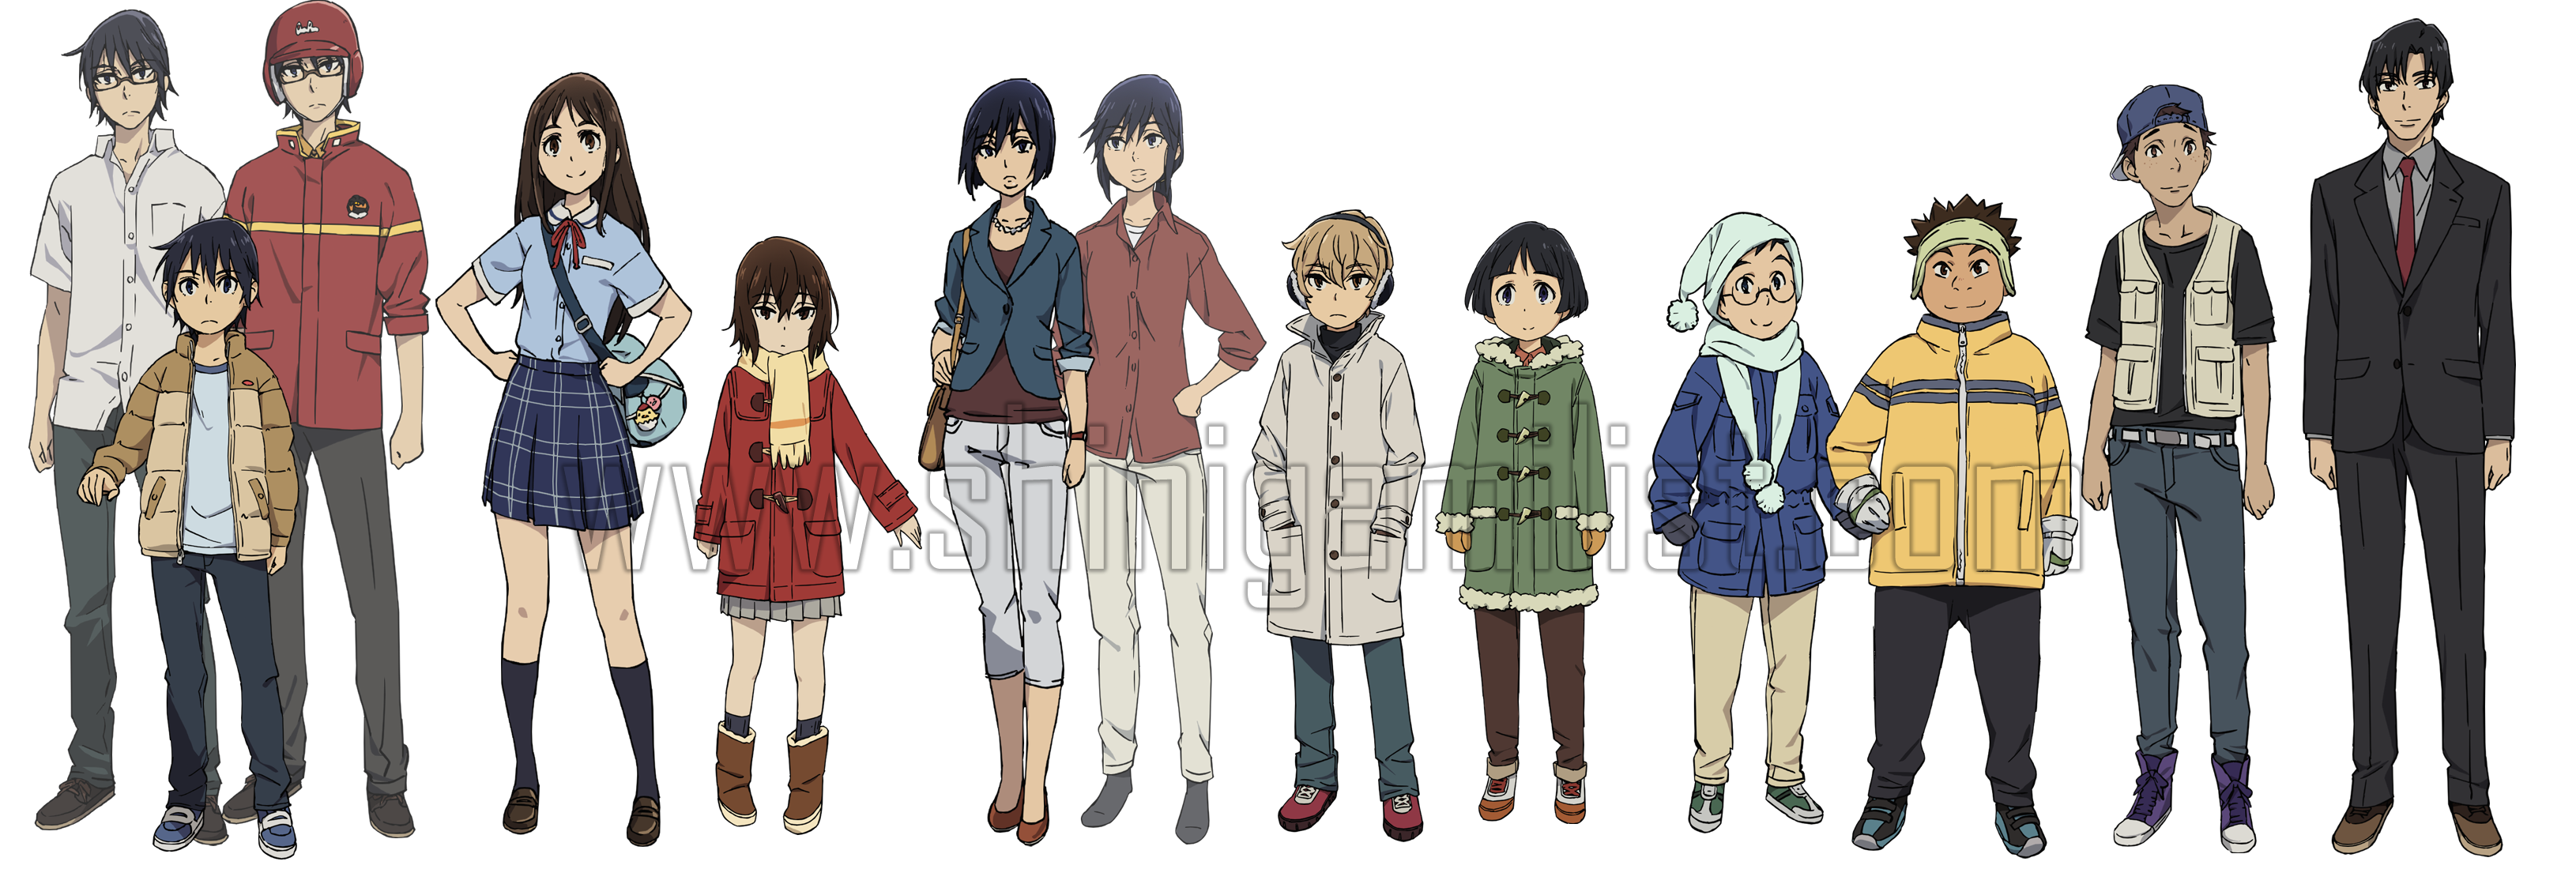 Bokumachi Characters Anime Reviews Anime Store Anime